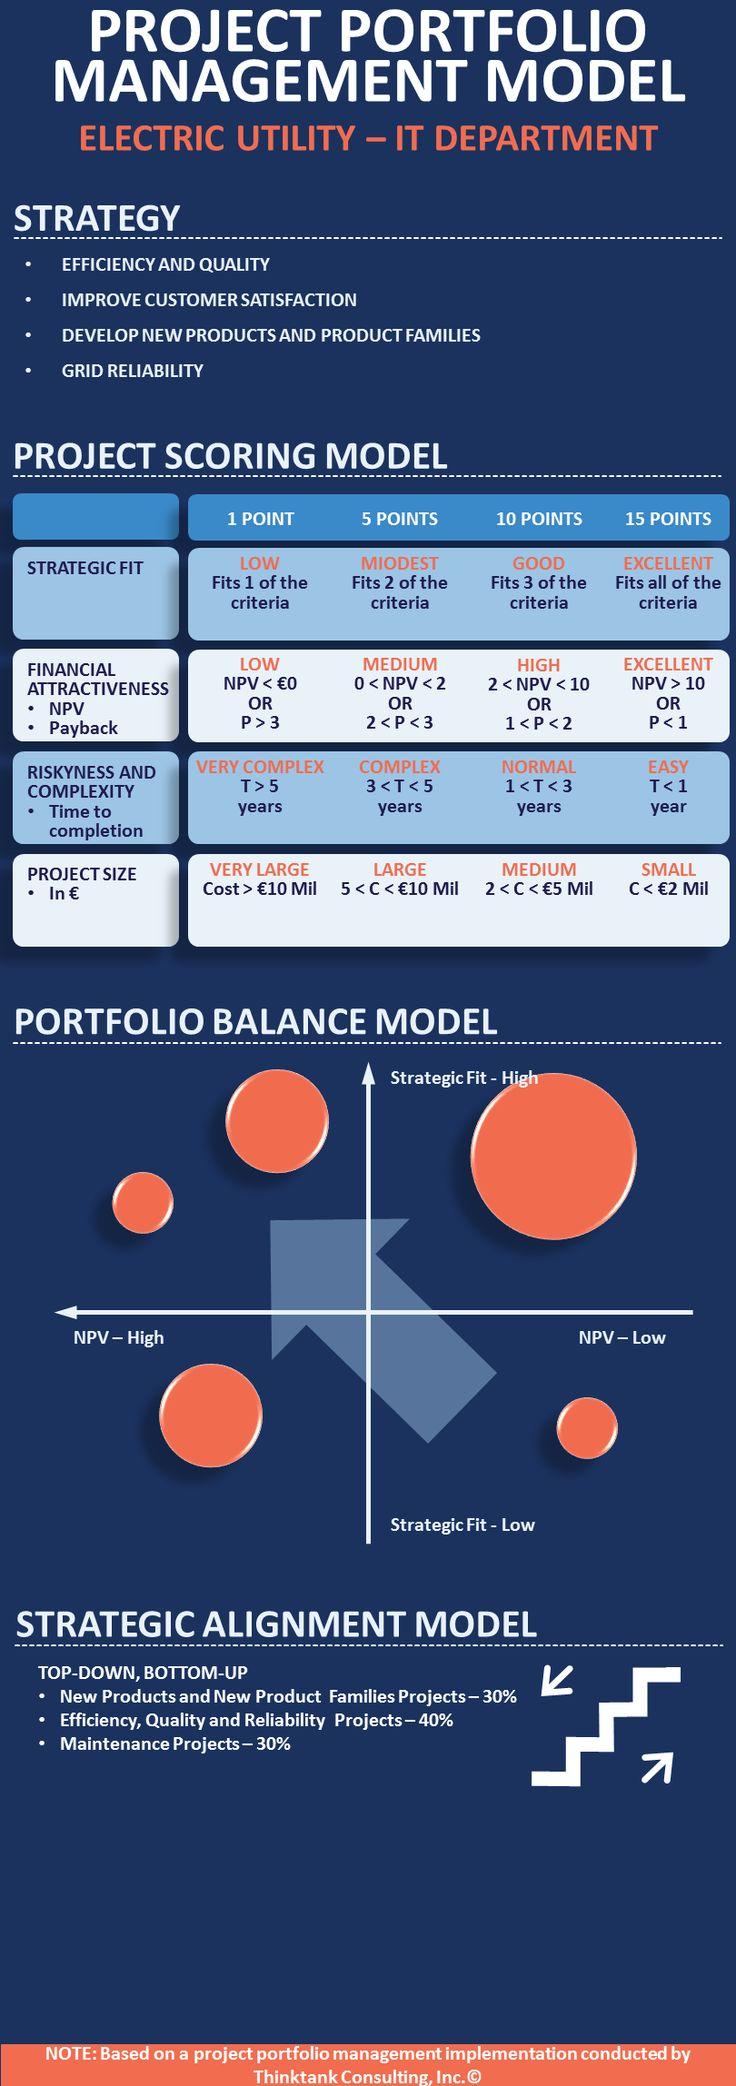 Infographic - Project Portfolio Management Model - Electric Utility Service Provider | Jamal Moustafaev, MBA, PMP | Pulse | LinkedIn